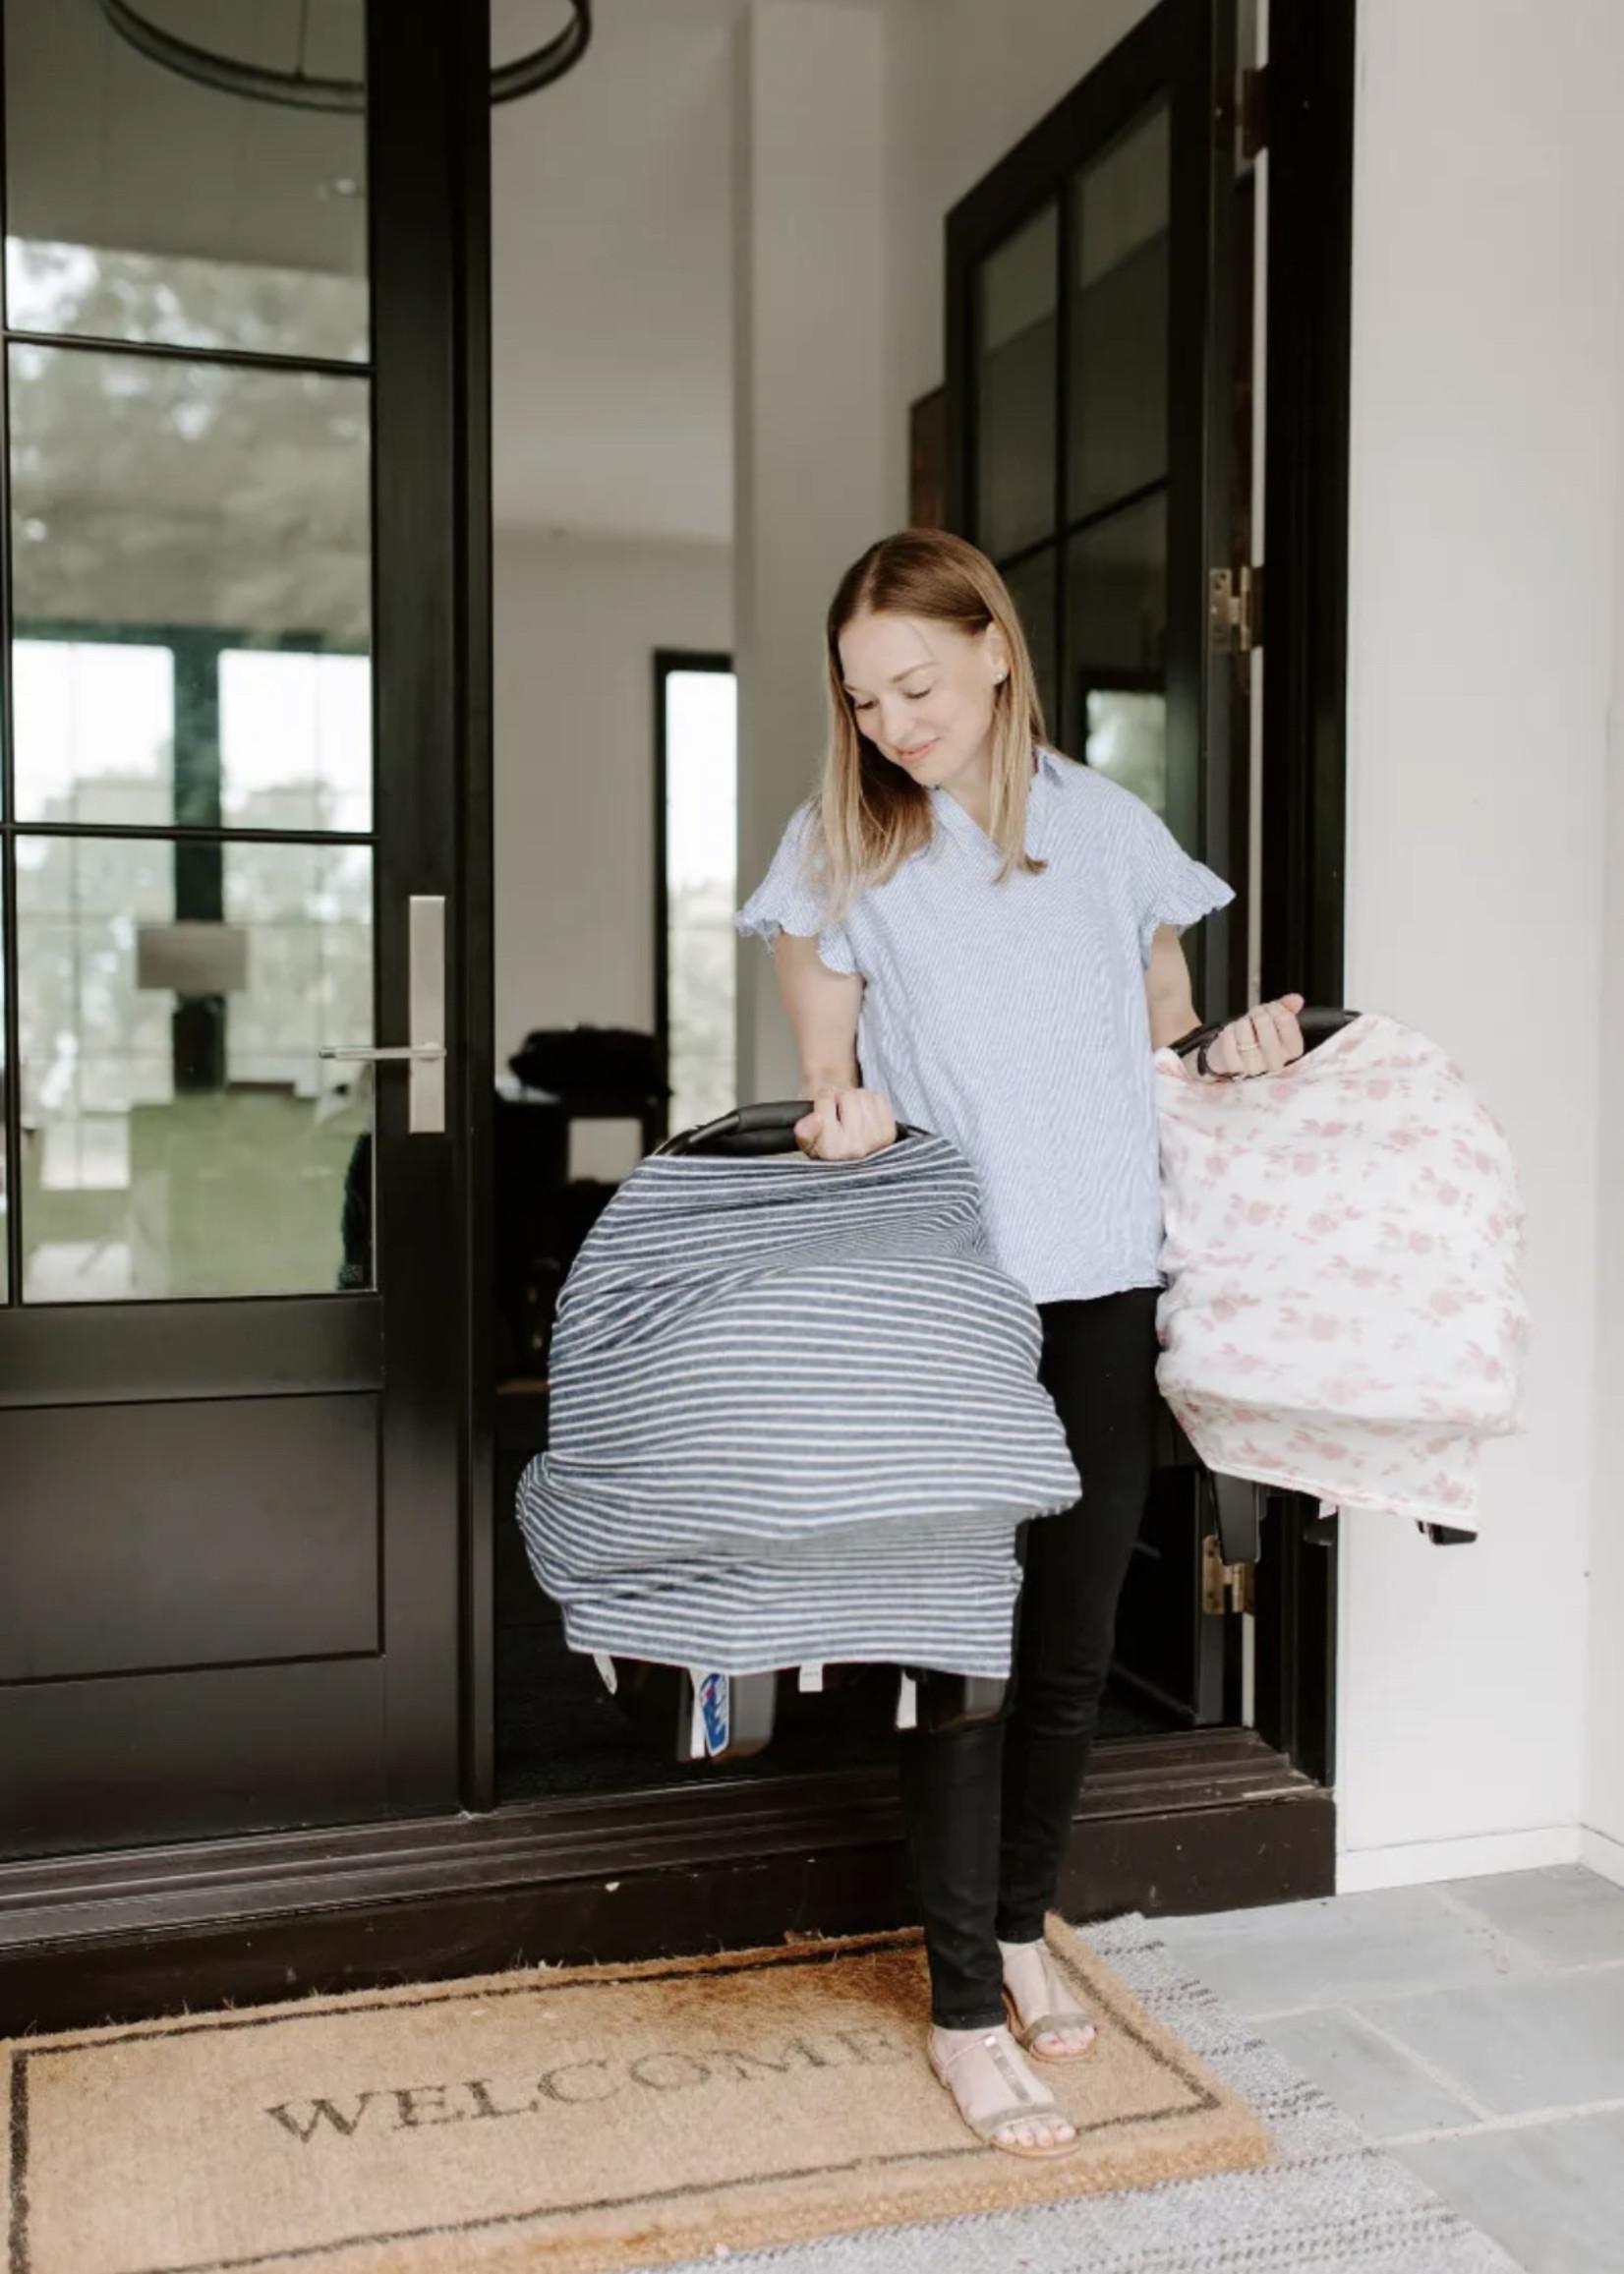 Elitaire Petite Heather Grey Snuggle Knit Multi Use Cover